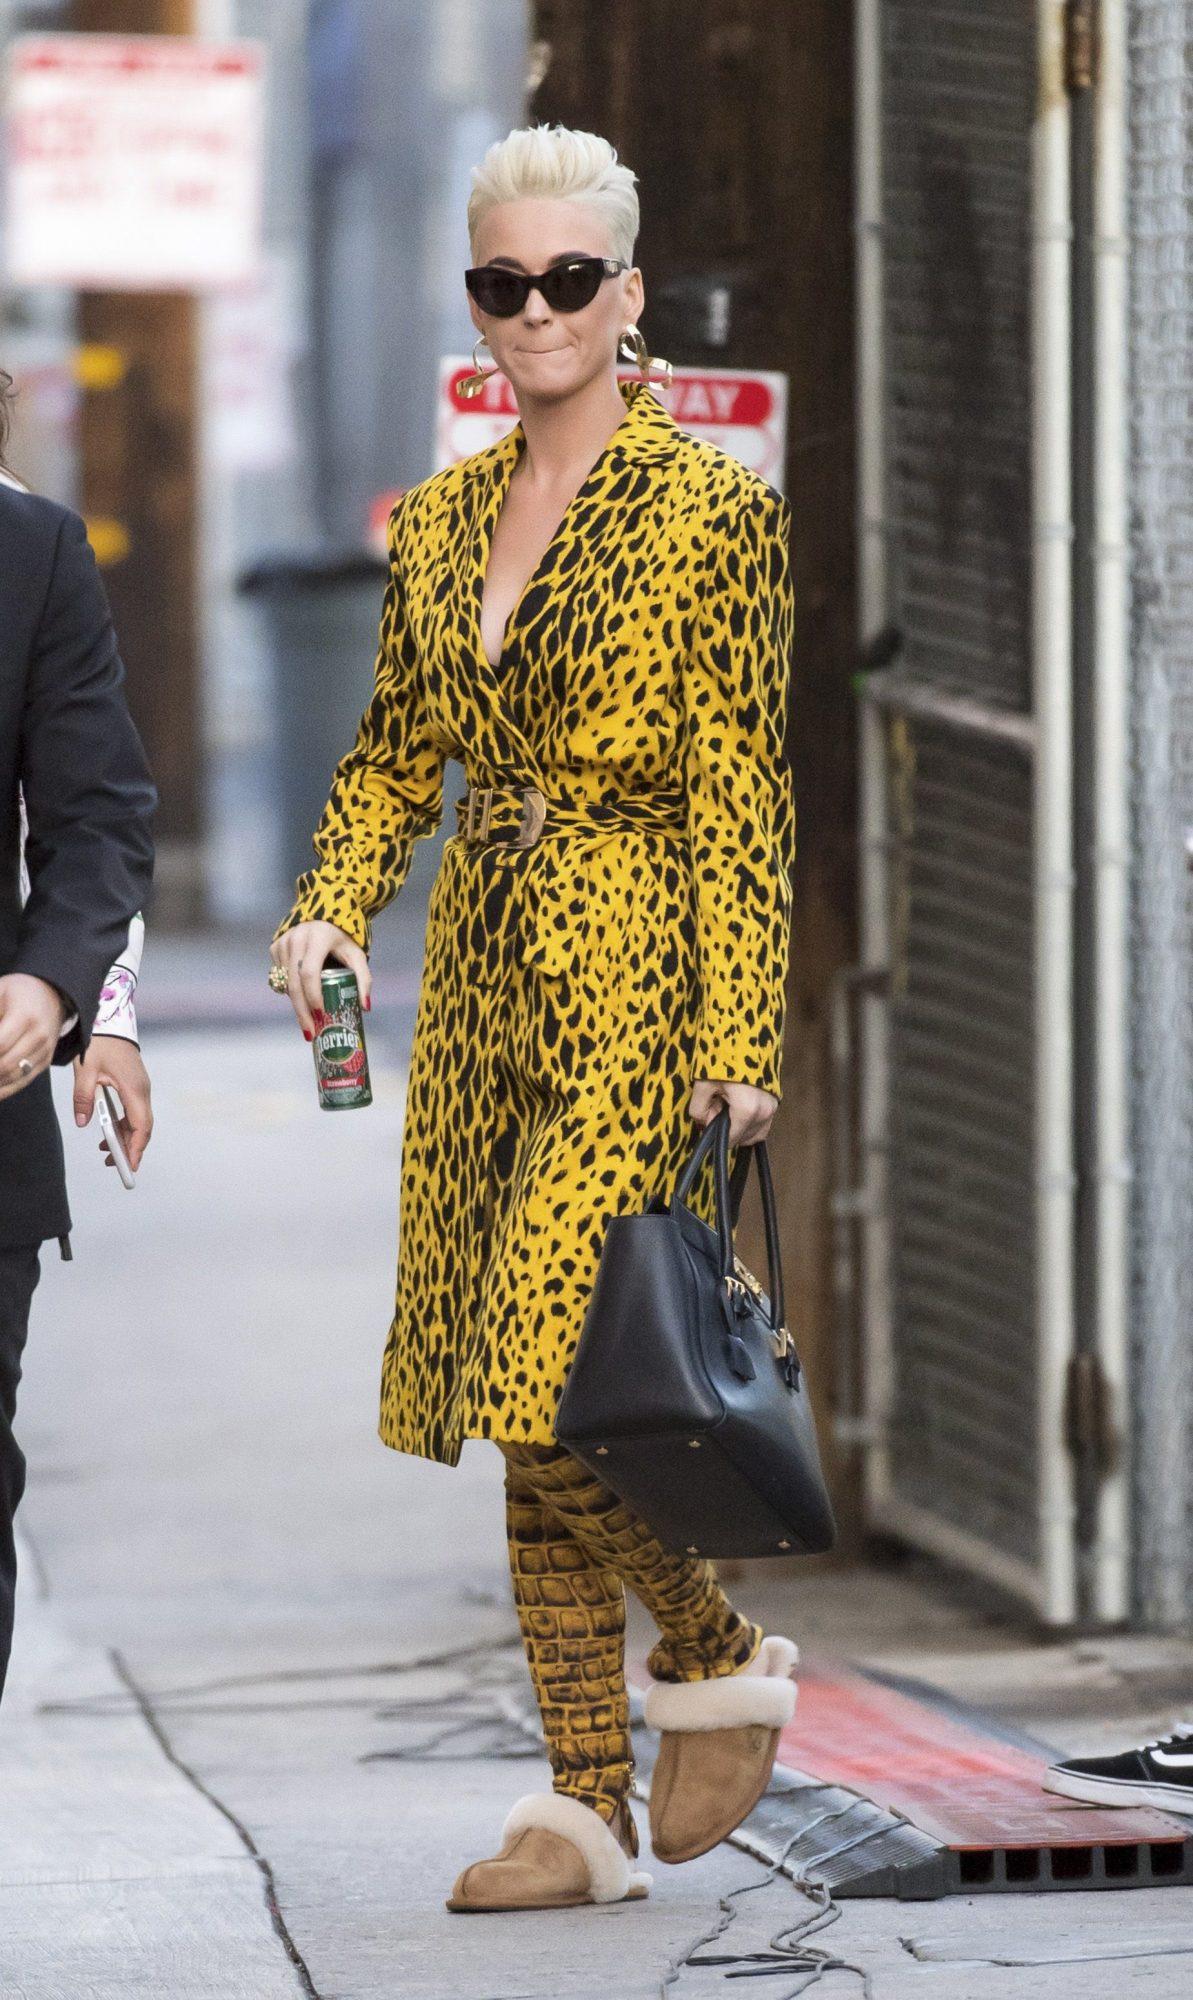 Katty Perry, fashion